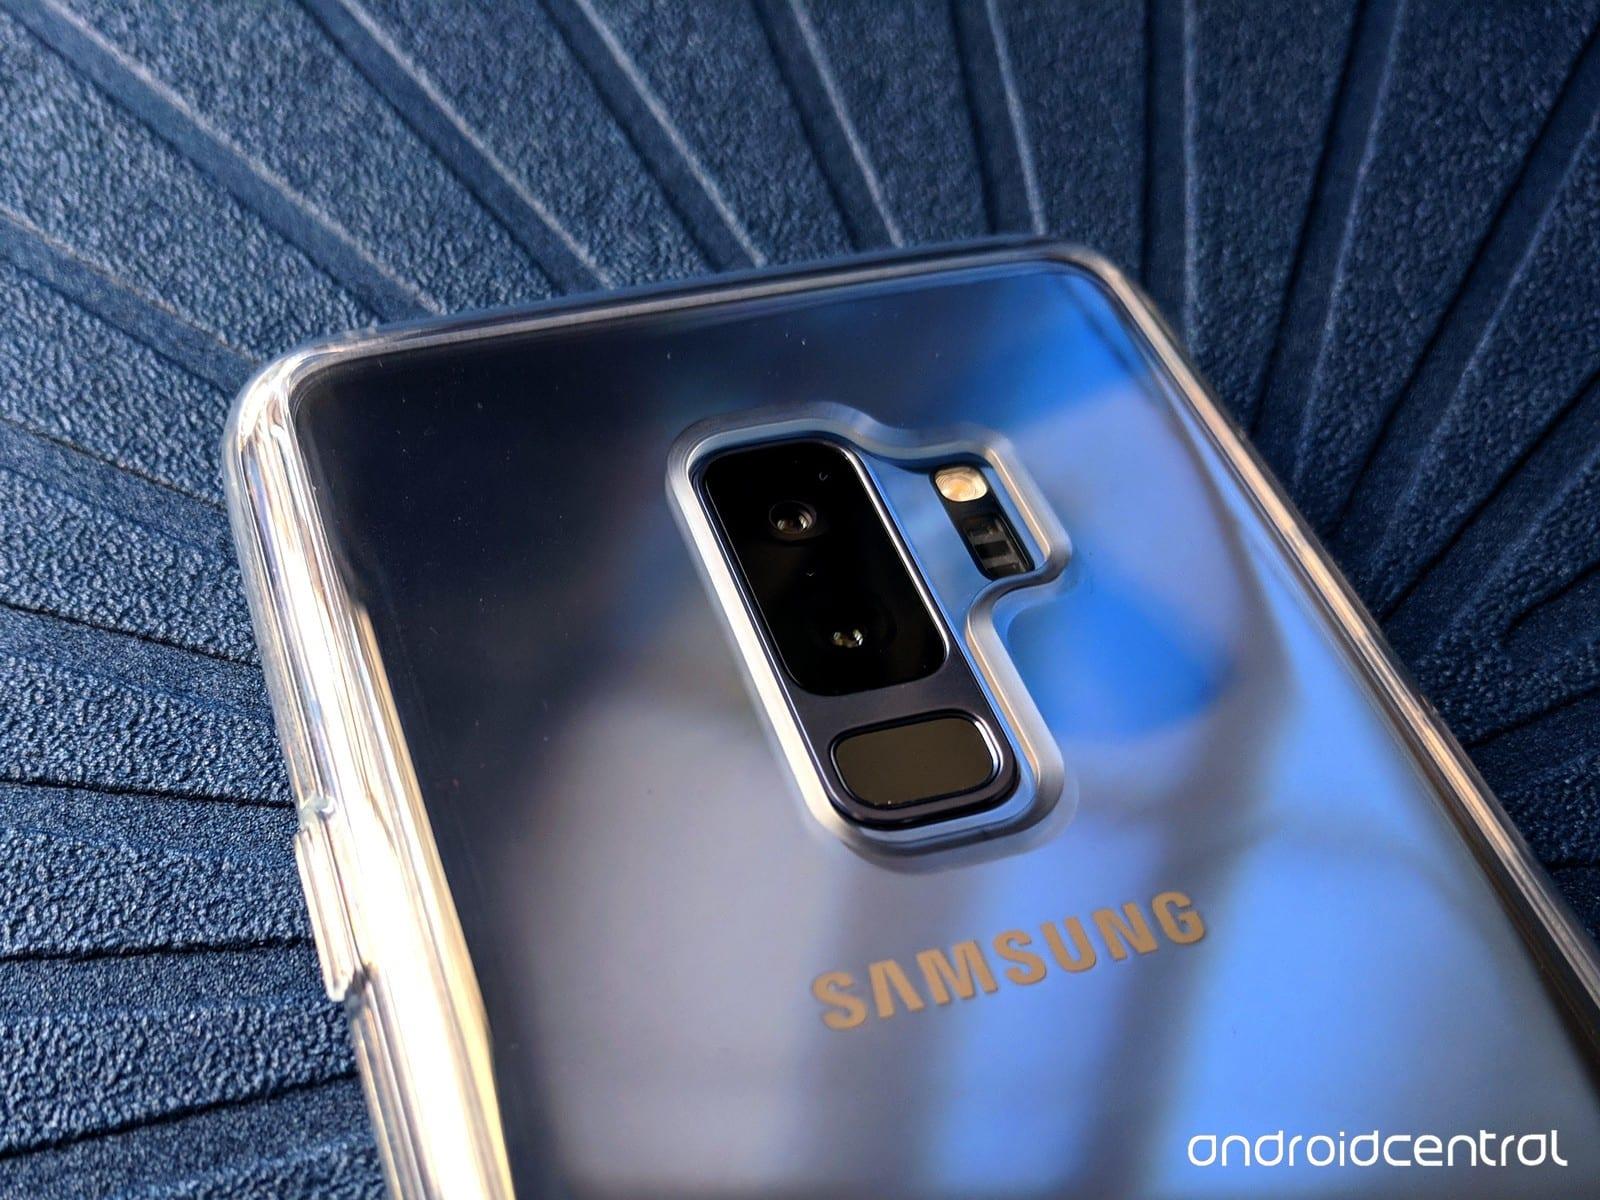 Recenzja etui Ringke Fusion dla Samsunga Galaxy S9+